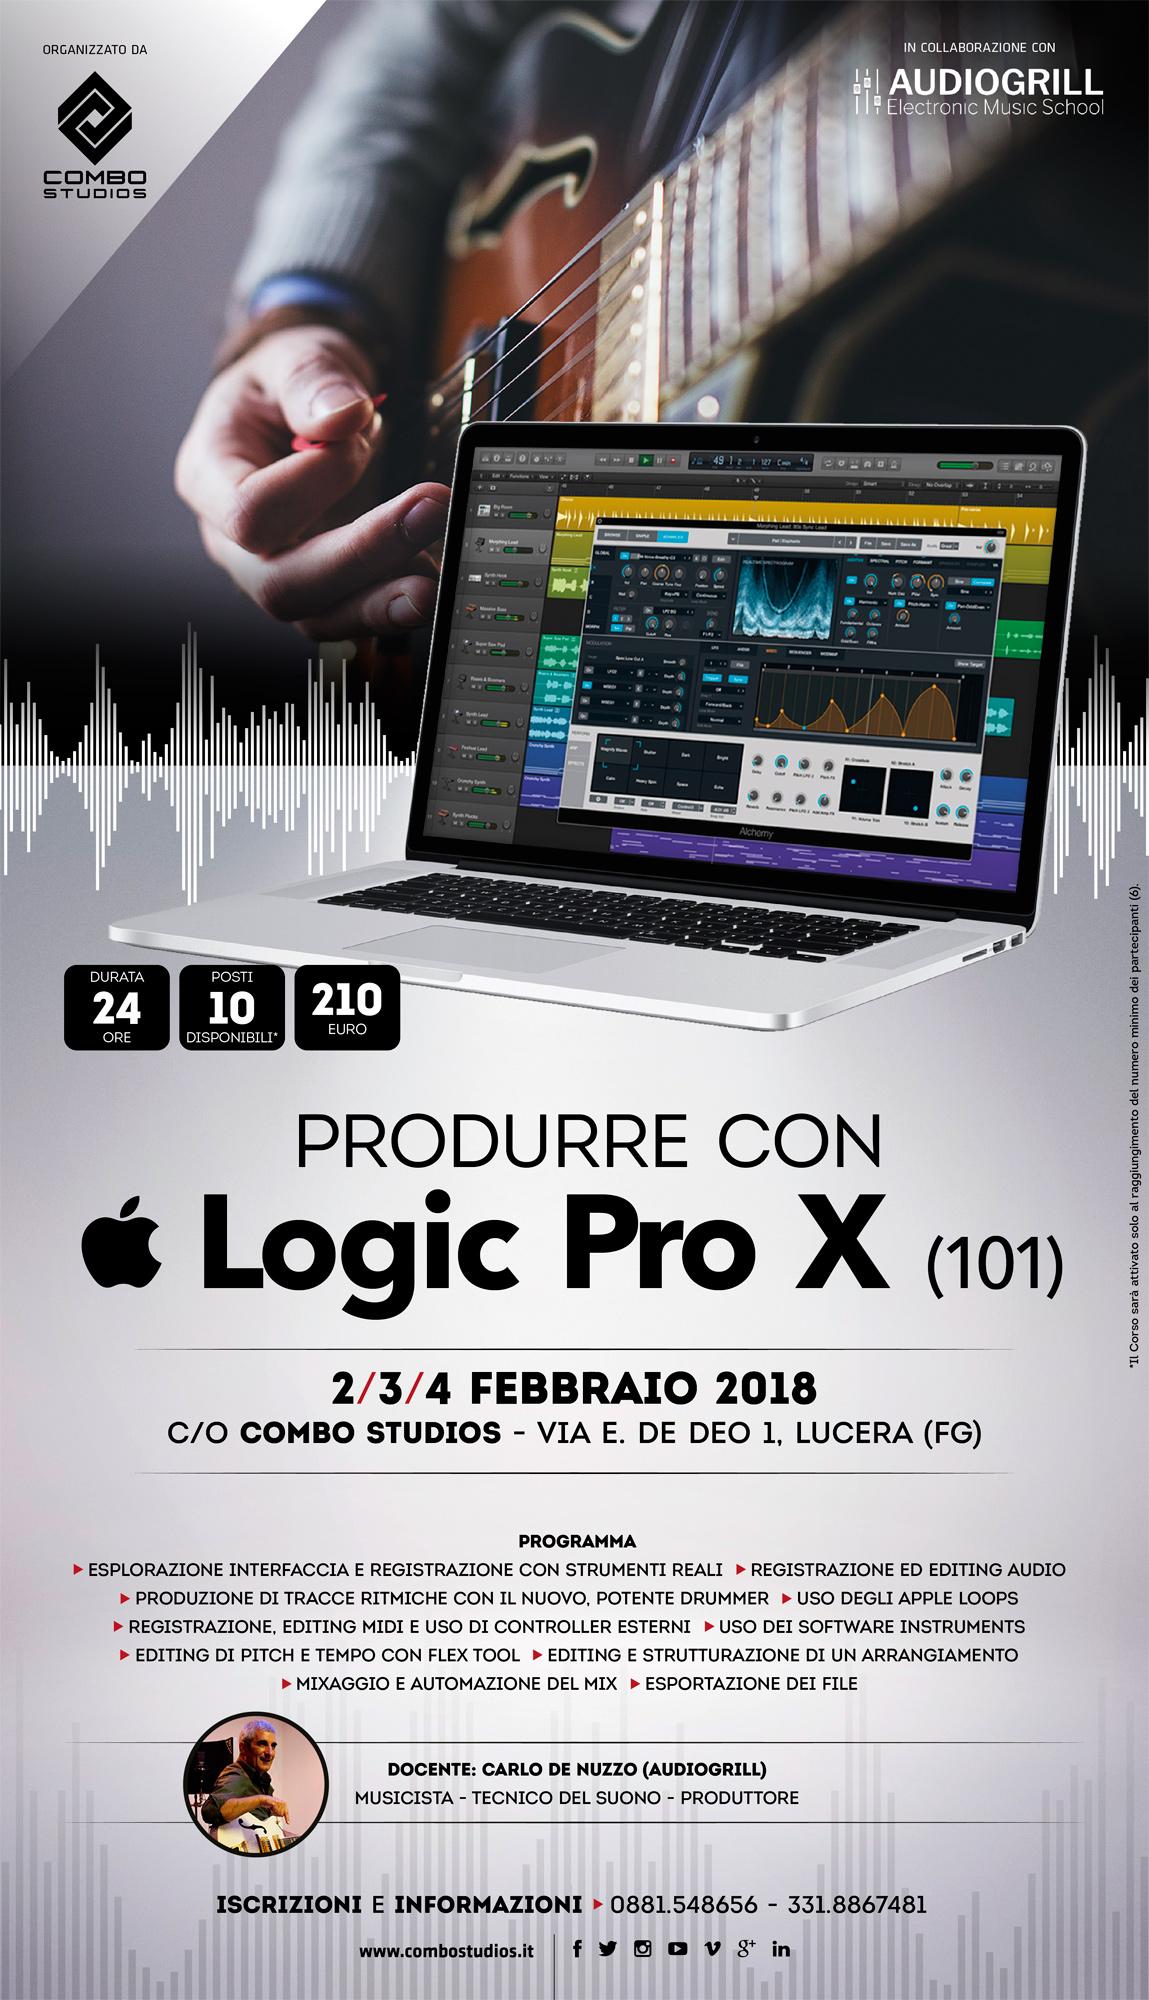 loc-corso-logic-pro-x_febbraio-2018-01